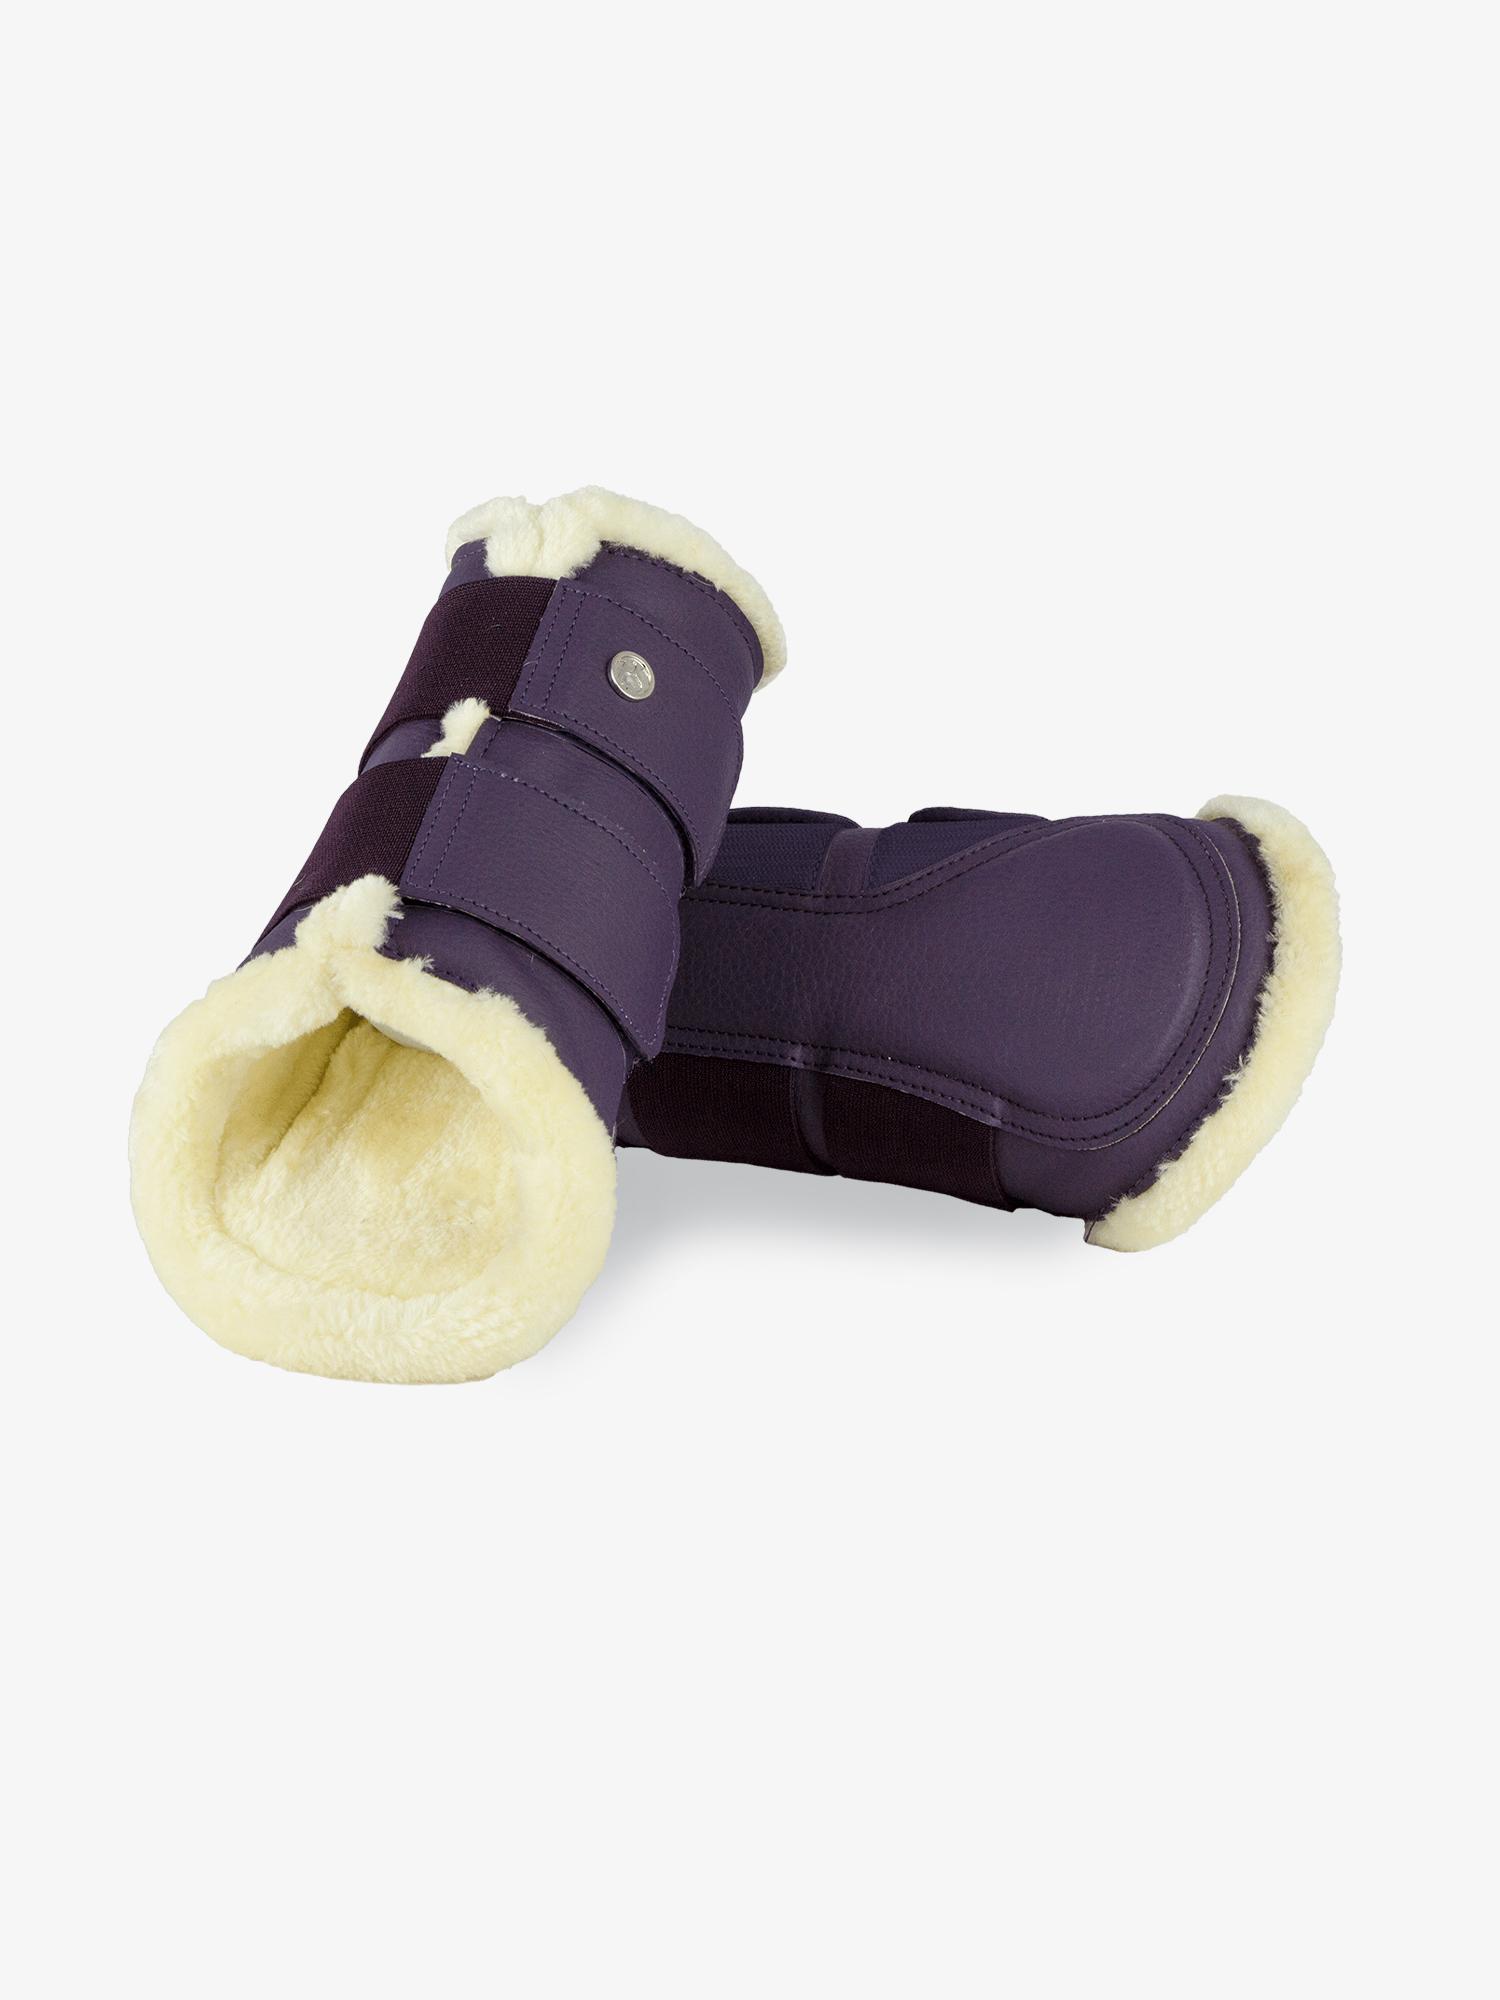 PS of Sweden 4er Set Gamaschen, Brushing Boots in Plum